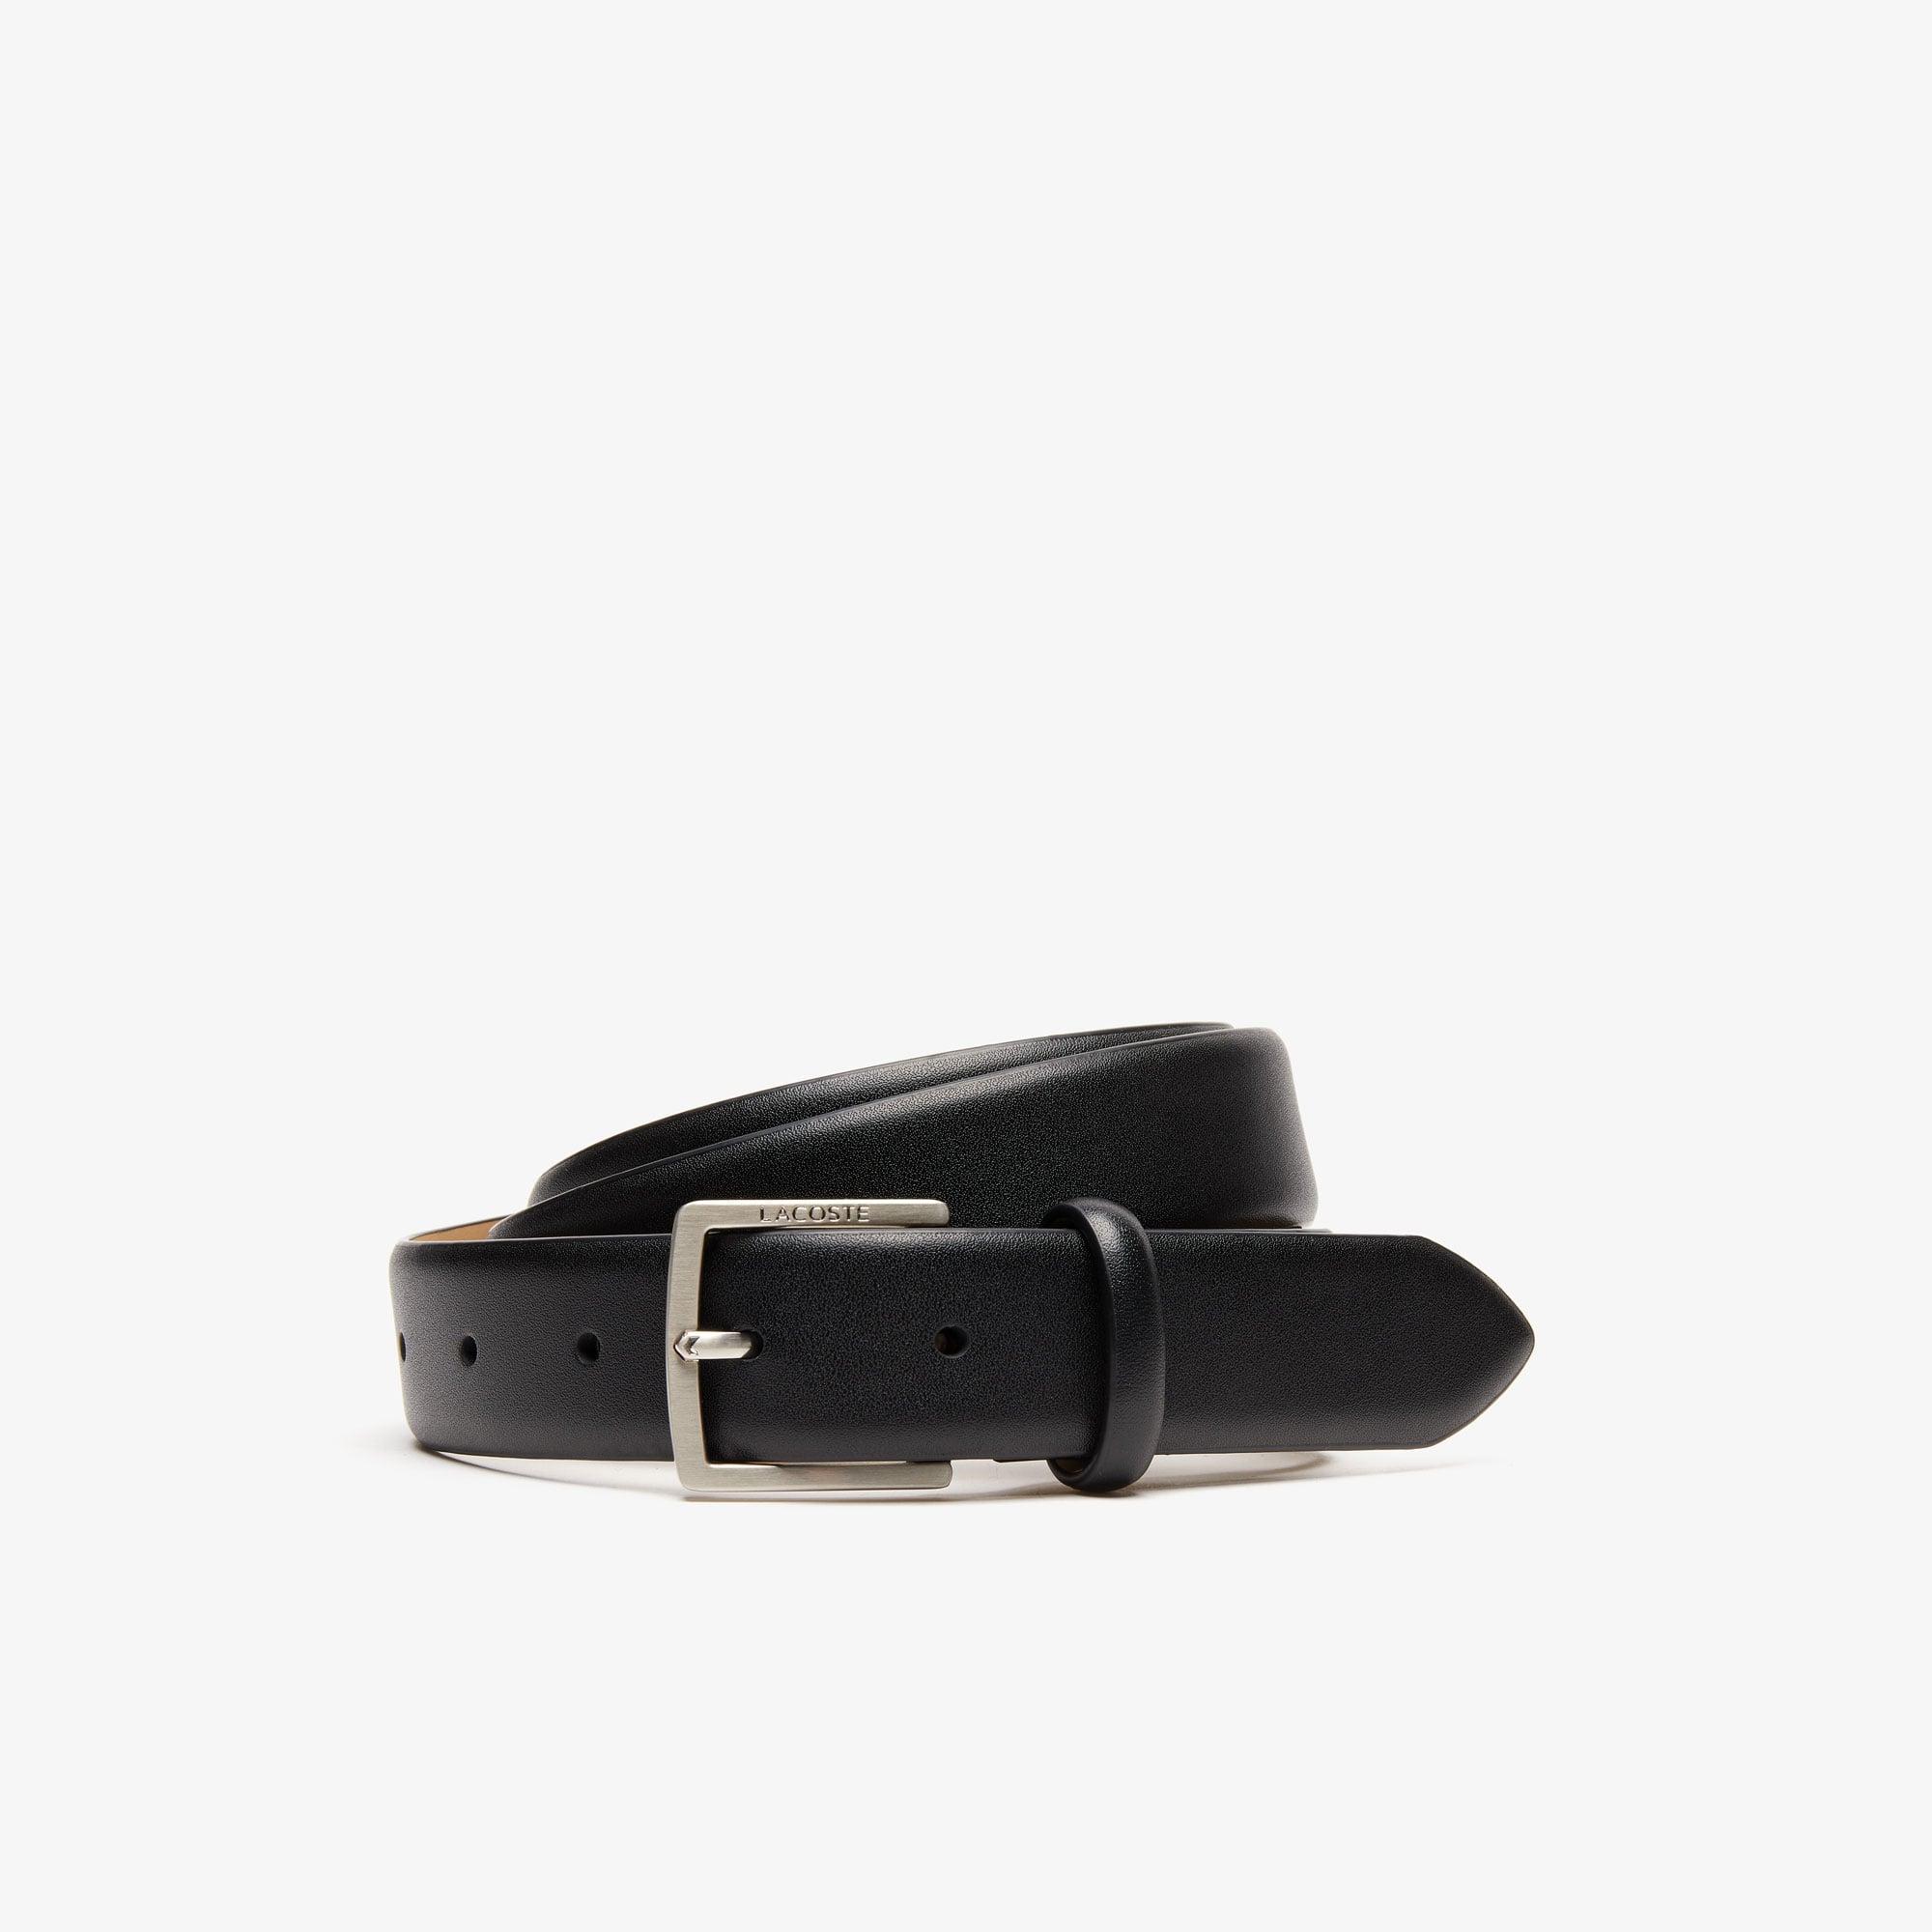 Lacoste Belts Men's Engraved-Buckle Leather Belt